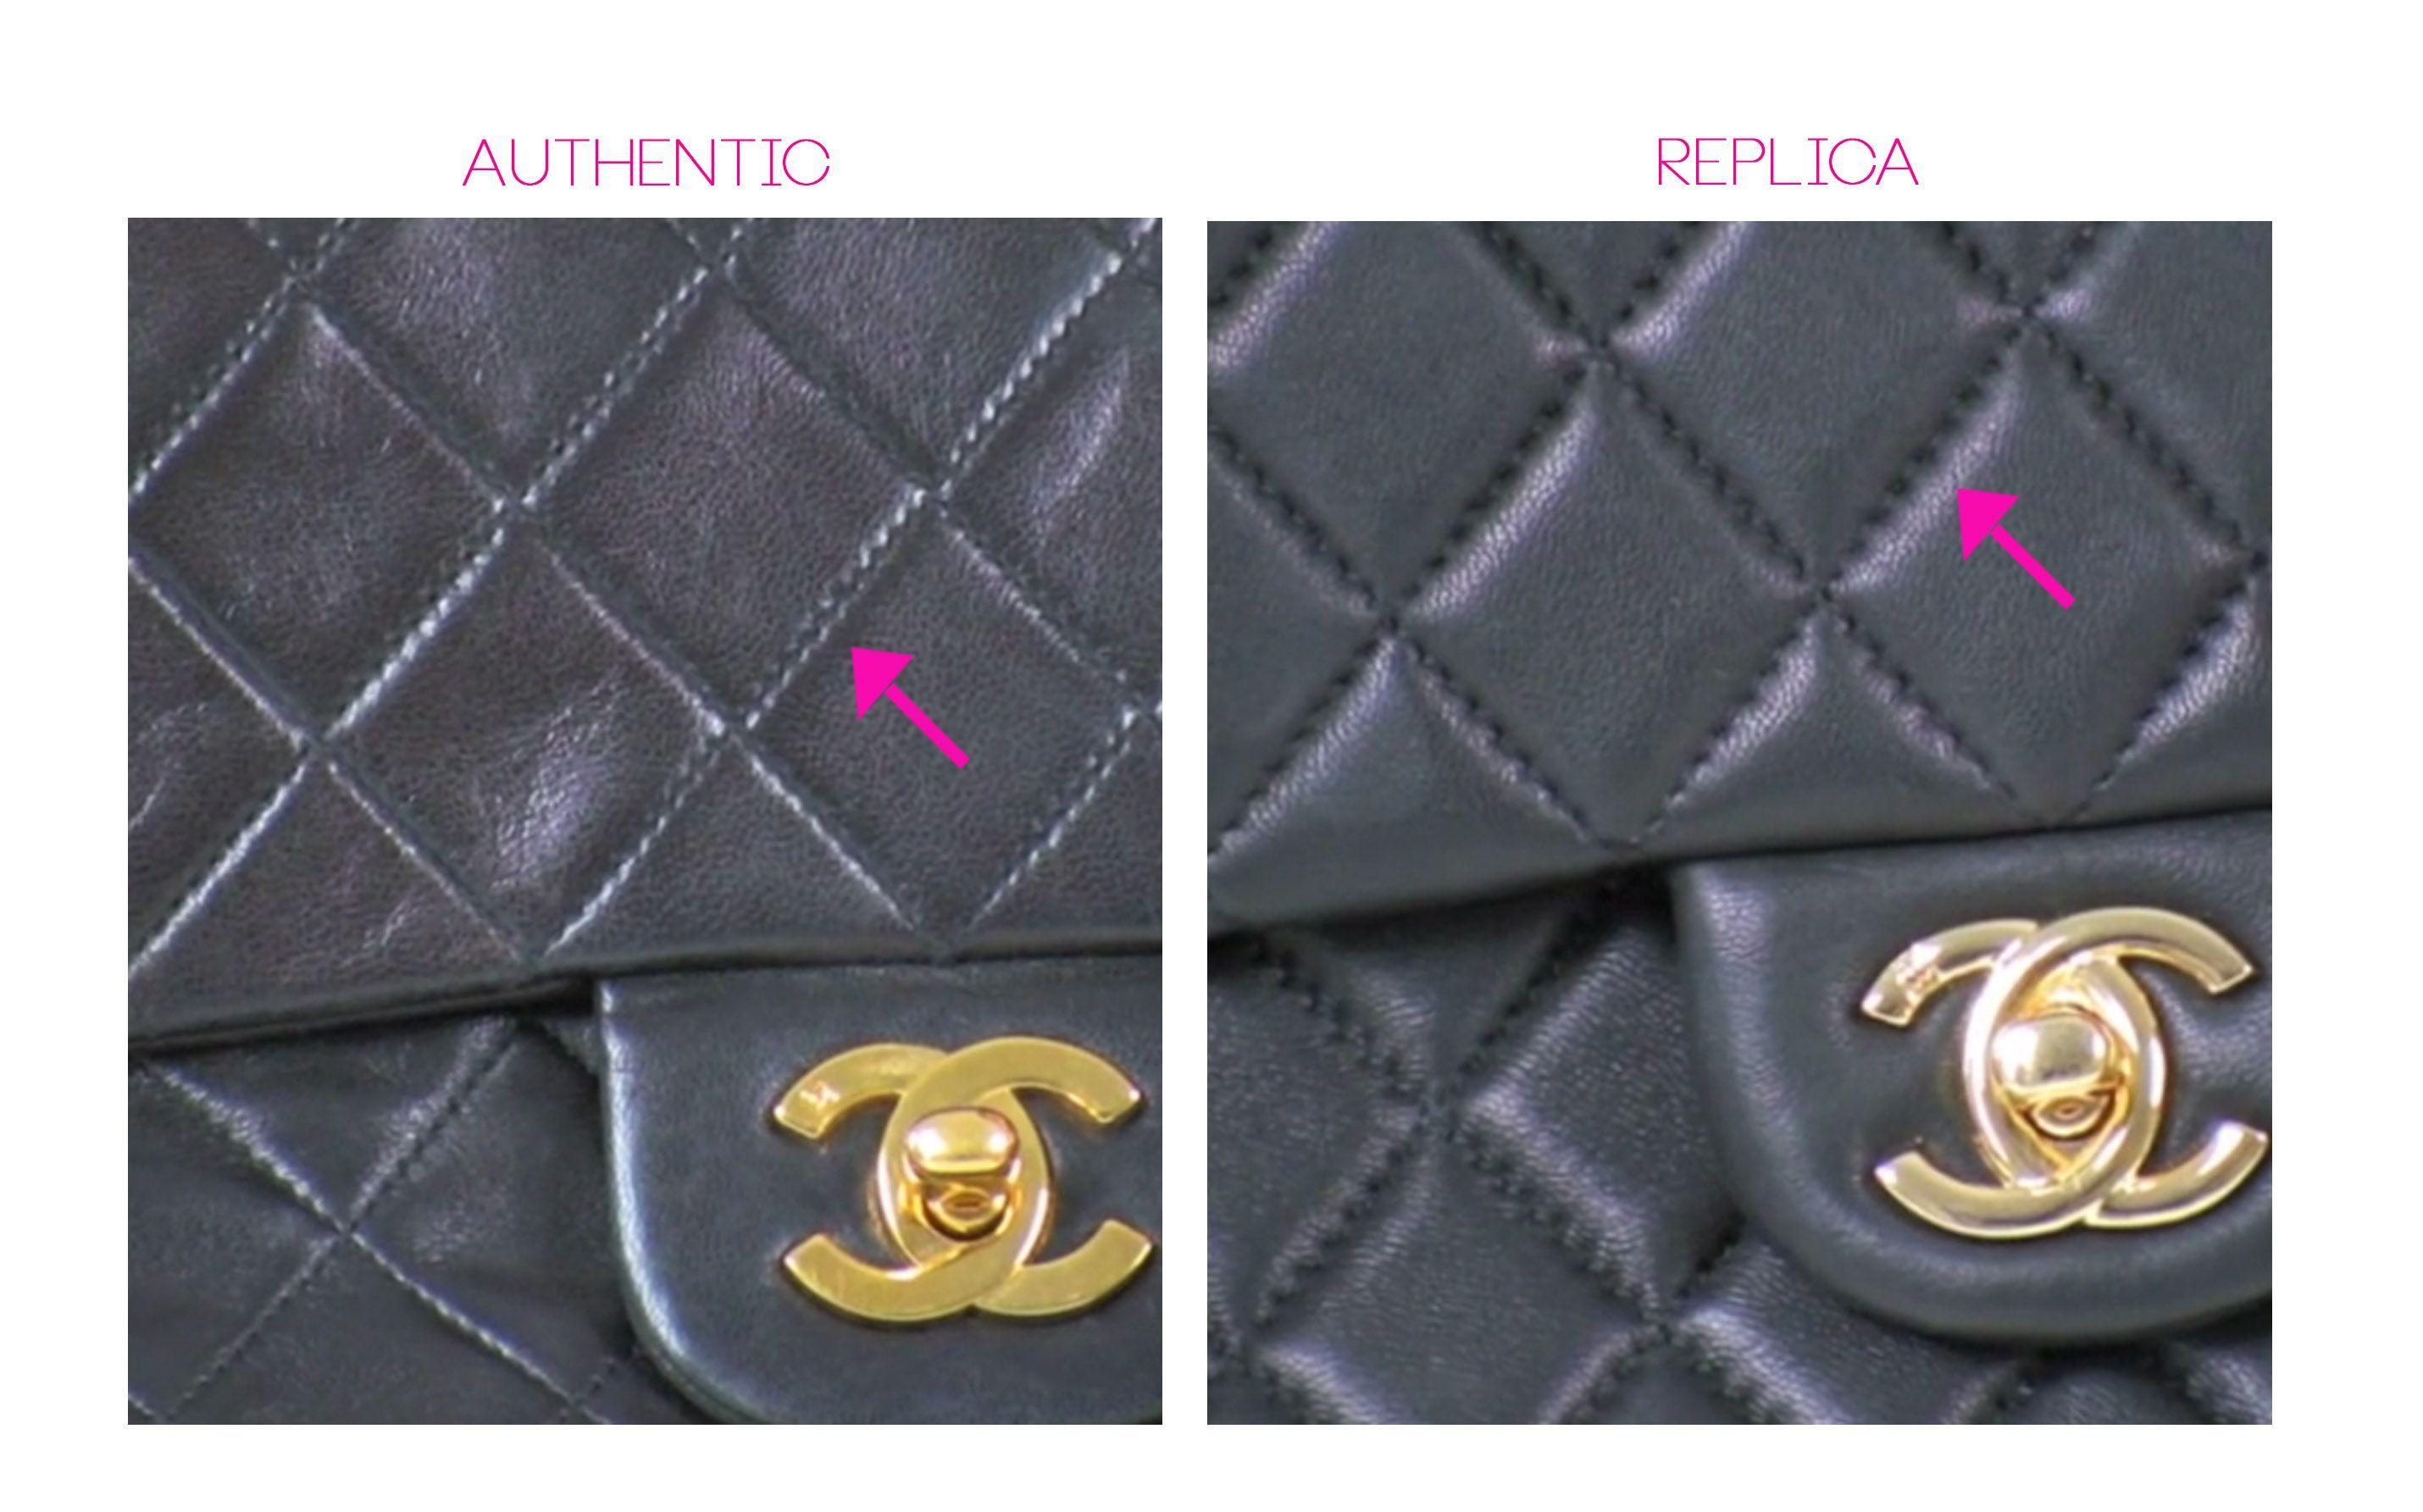 6c8b28ac44ae Stitch Count on Chanel Classic Flap Bag, Authentic Chanel handbags Boca  Raton, #Chanelhandbags